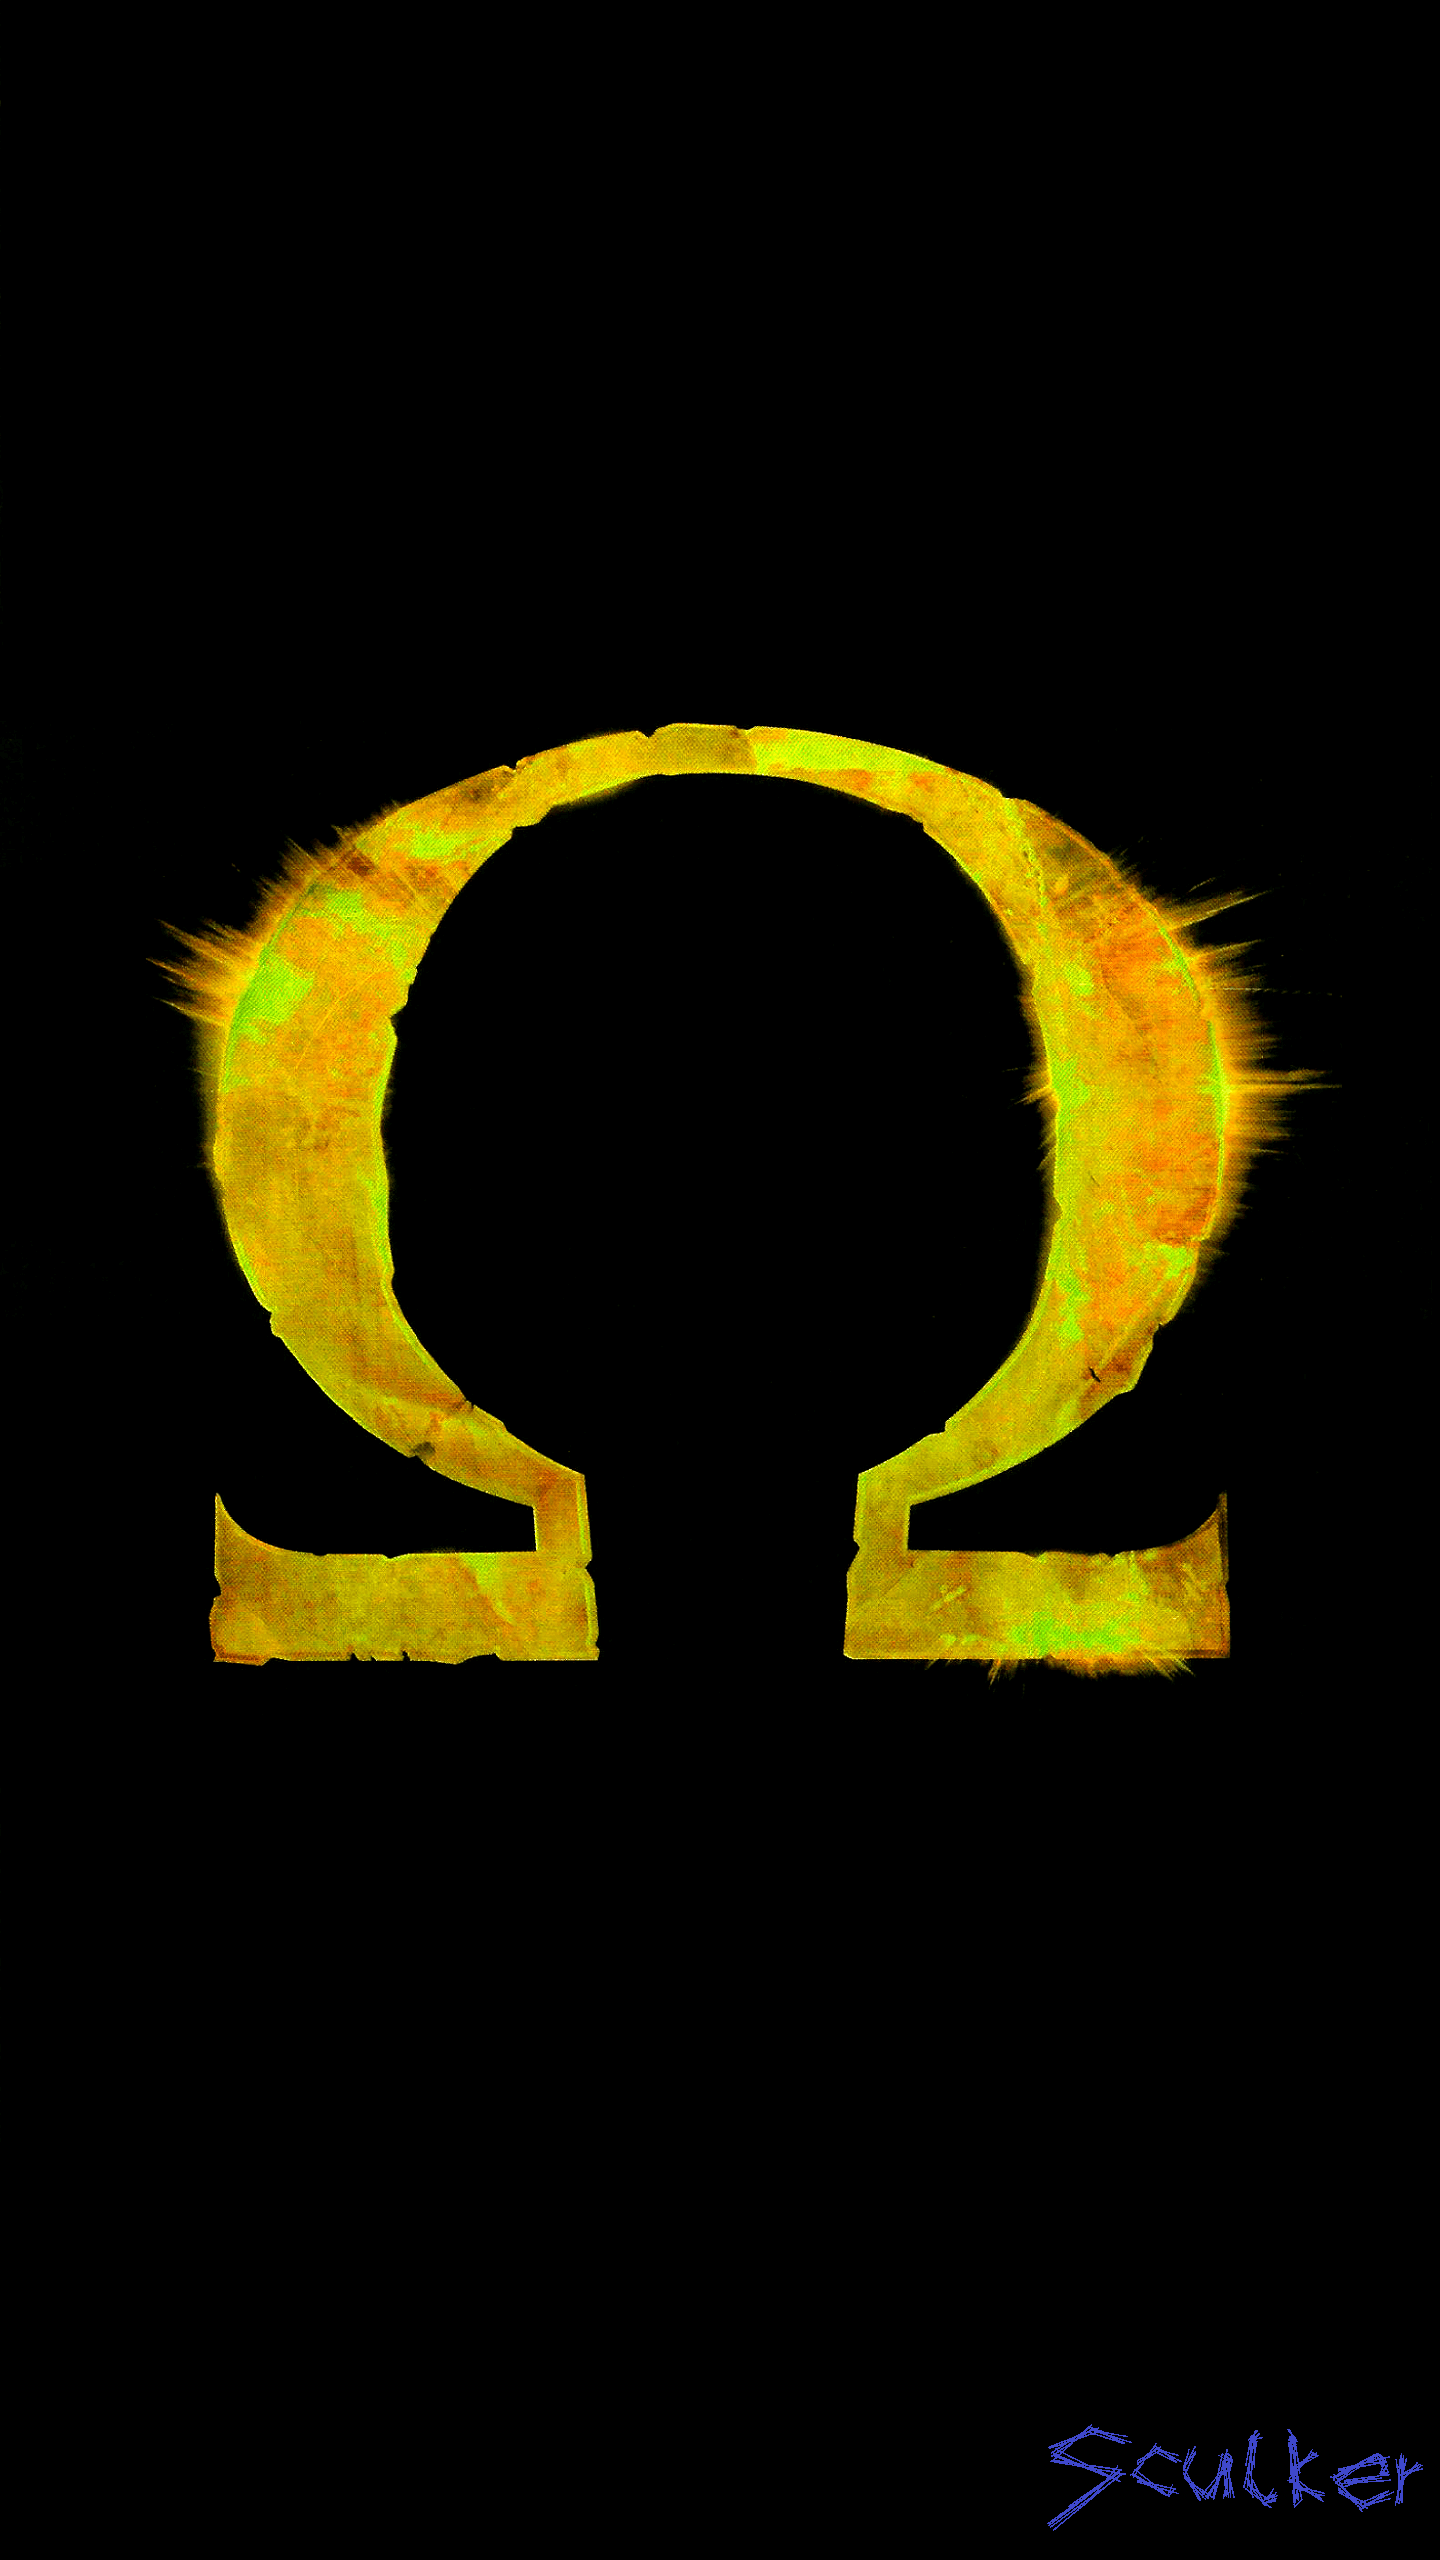 God of War Logo Wallpapers - Top Free God of War Logo ...